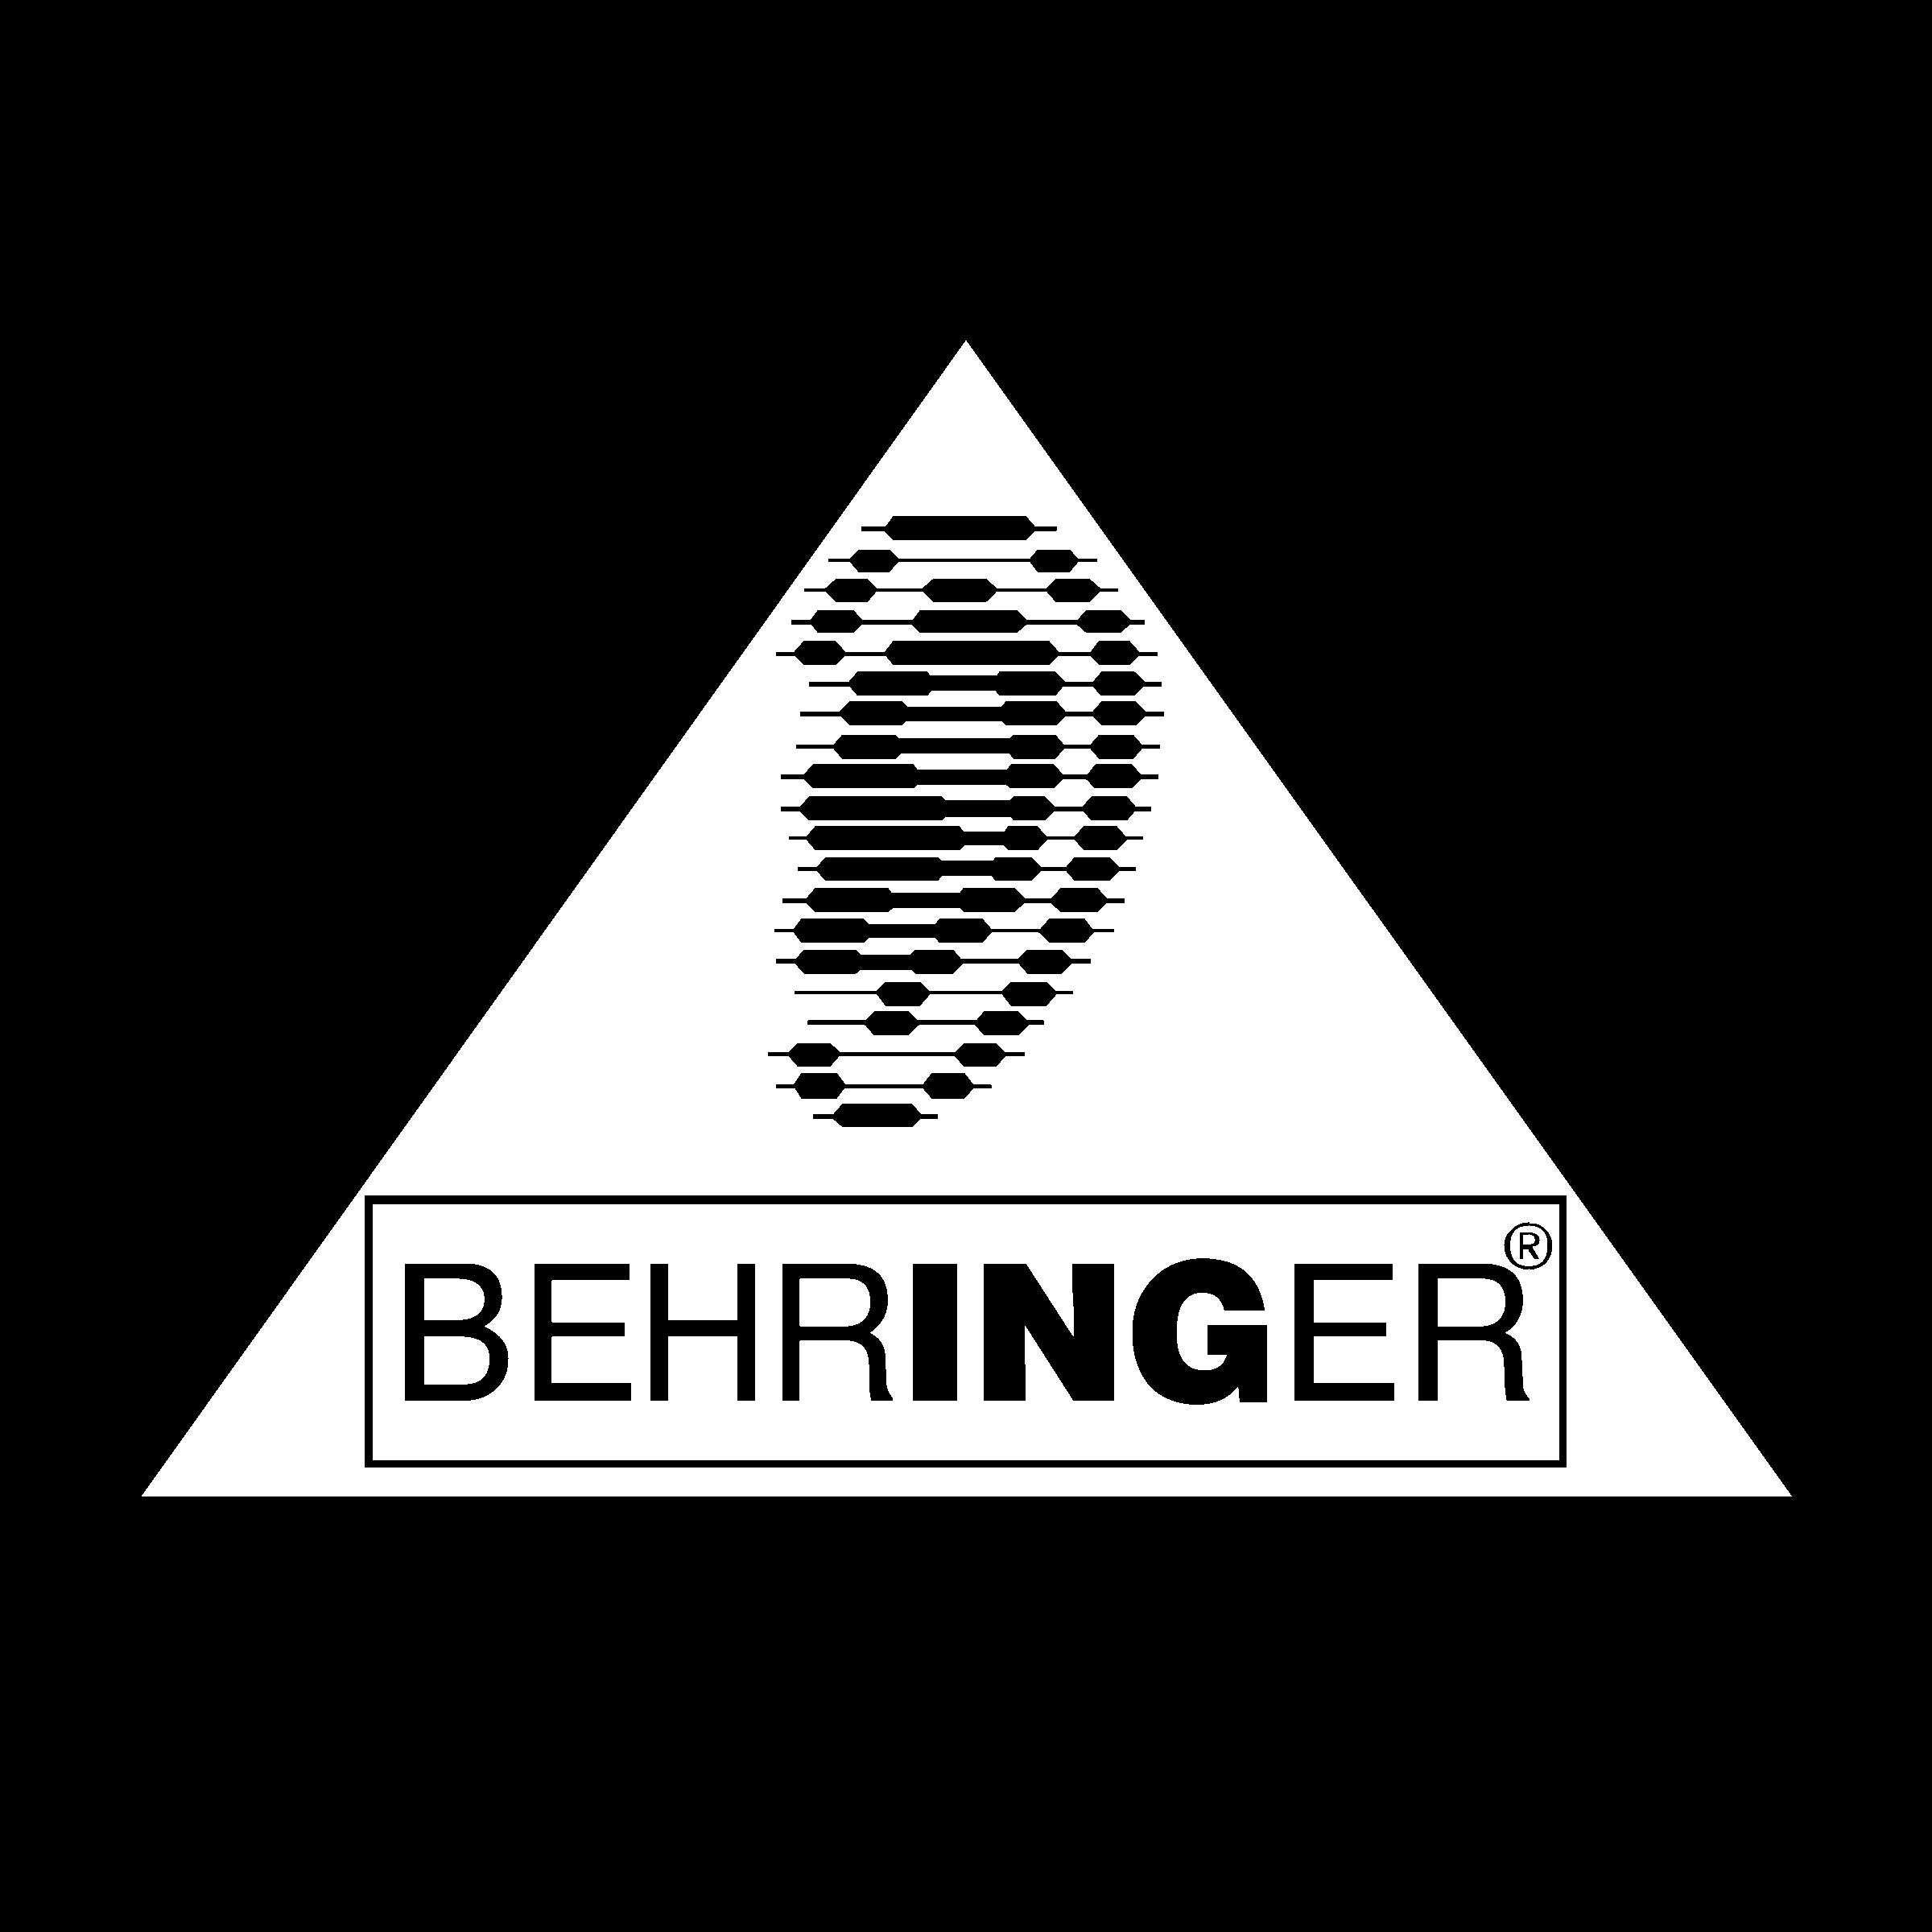 behringer logo wwwpixsharkcom images galleries with